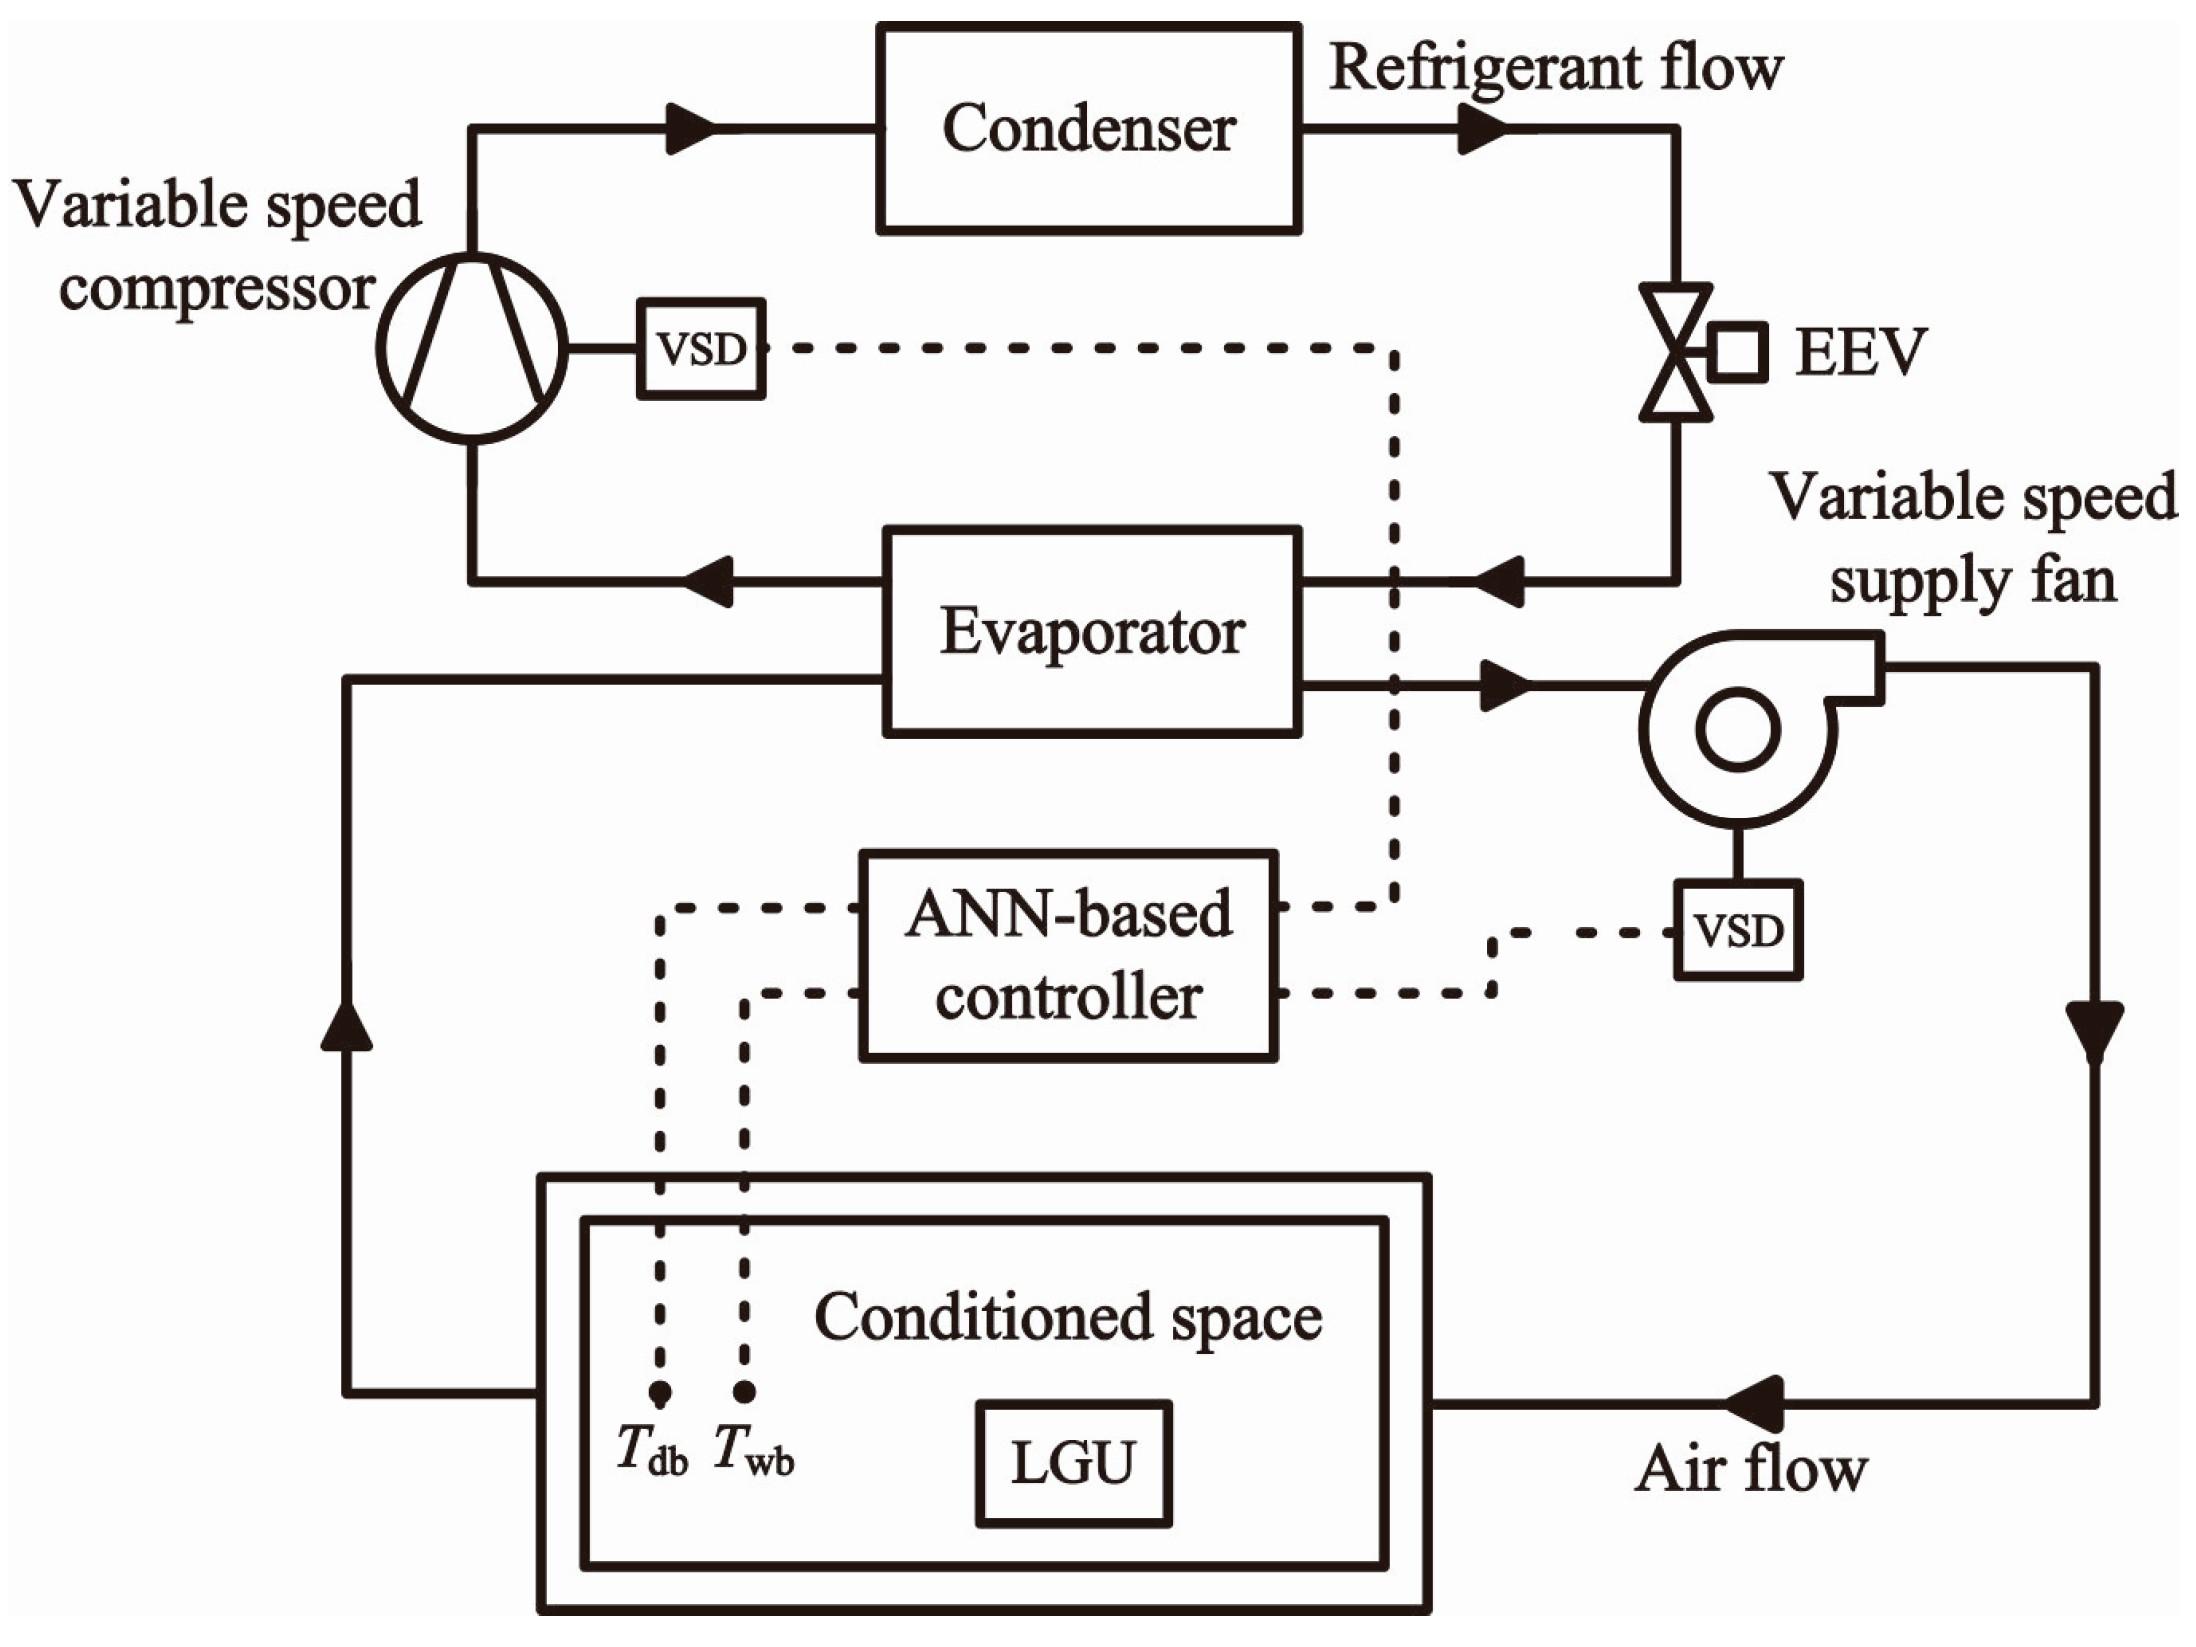 Automotive Air Conditioning System Diagram Energies Free Full Text Of Automotive Air Conditioning System Diagram